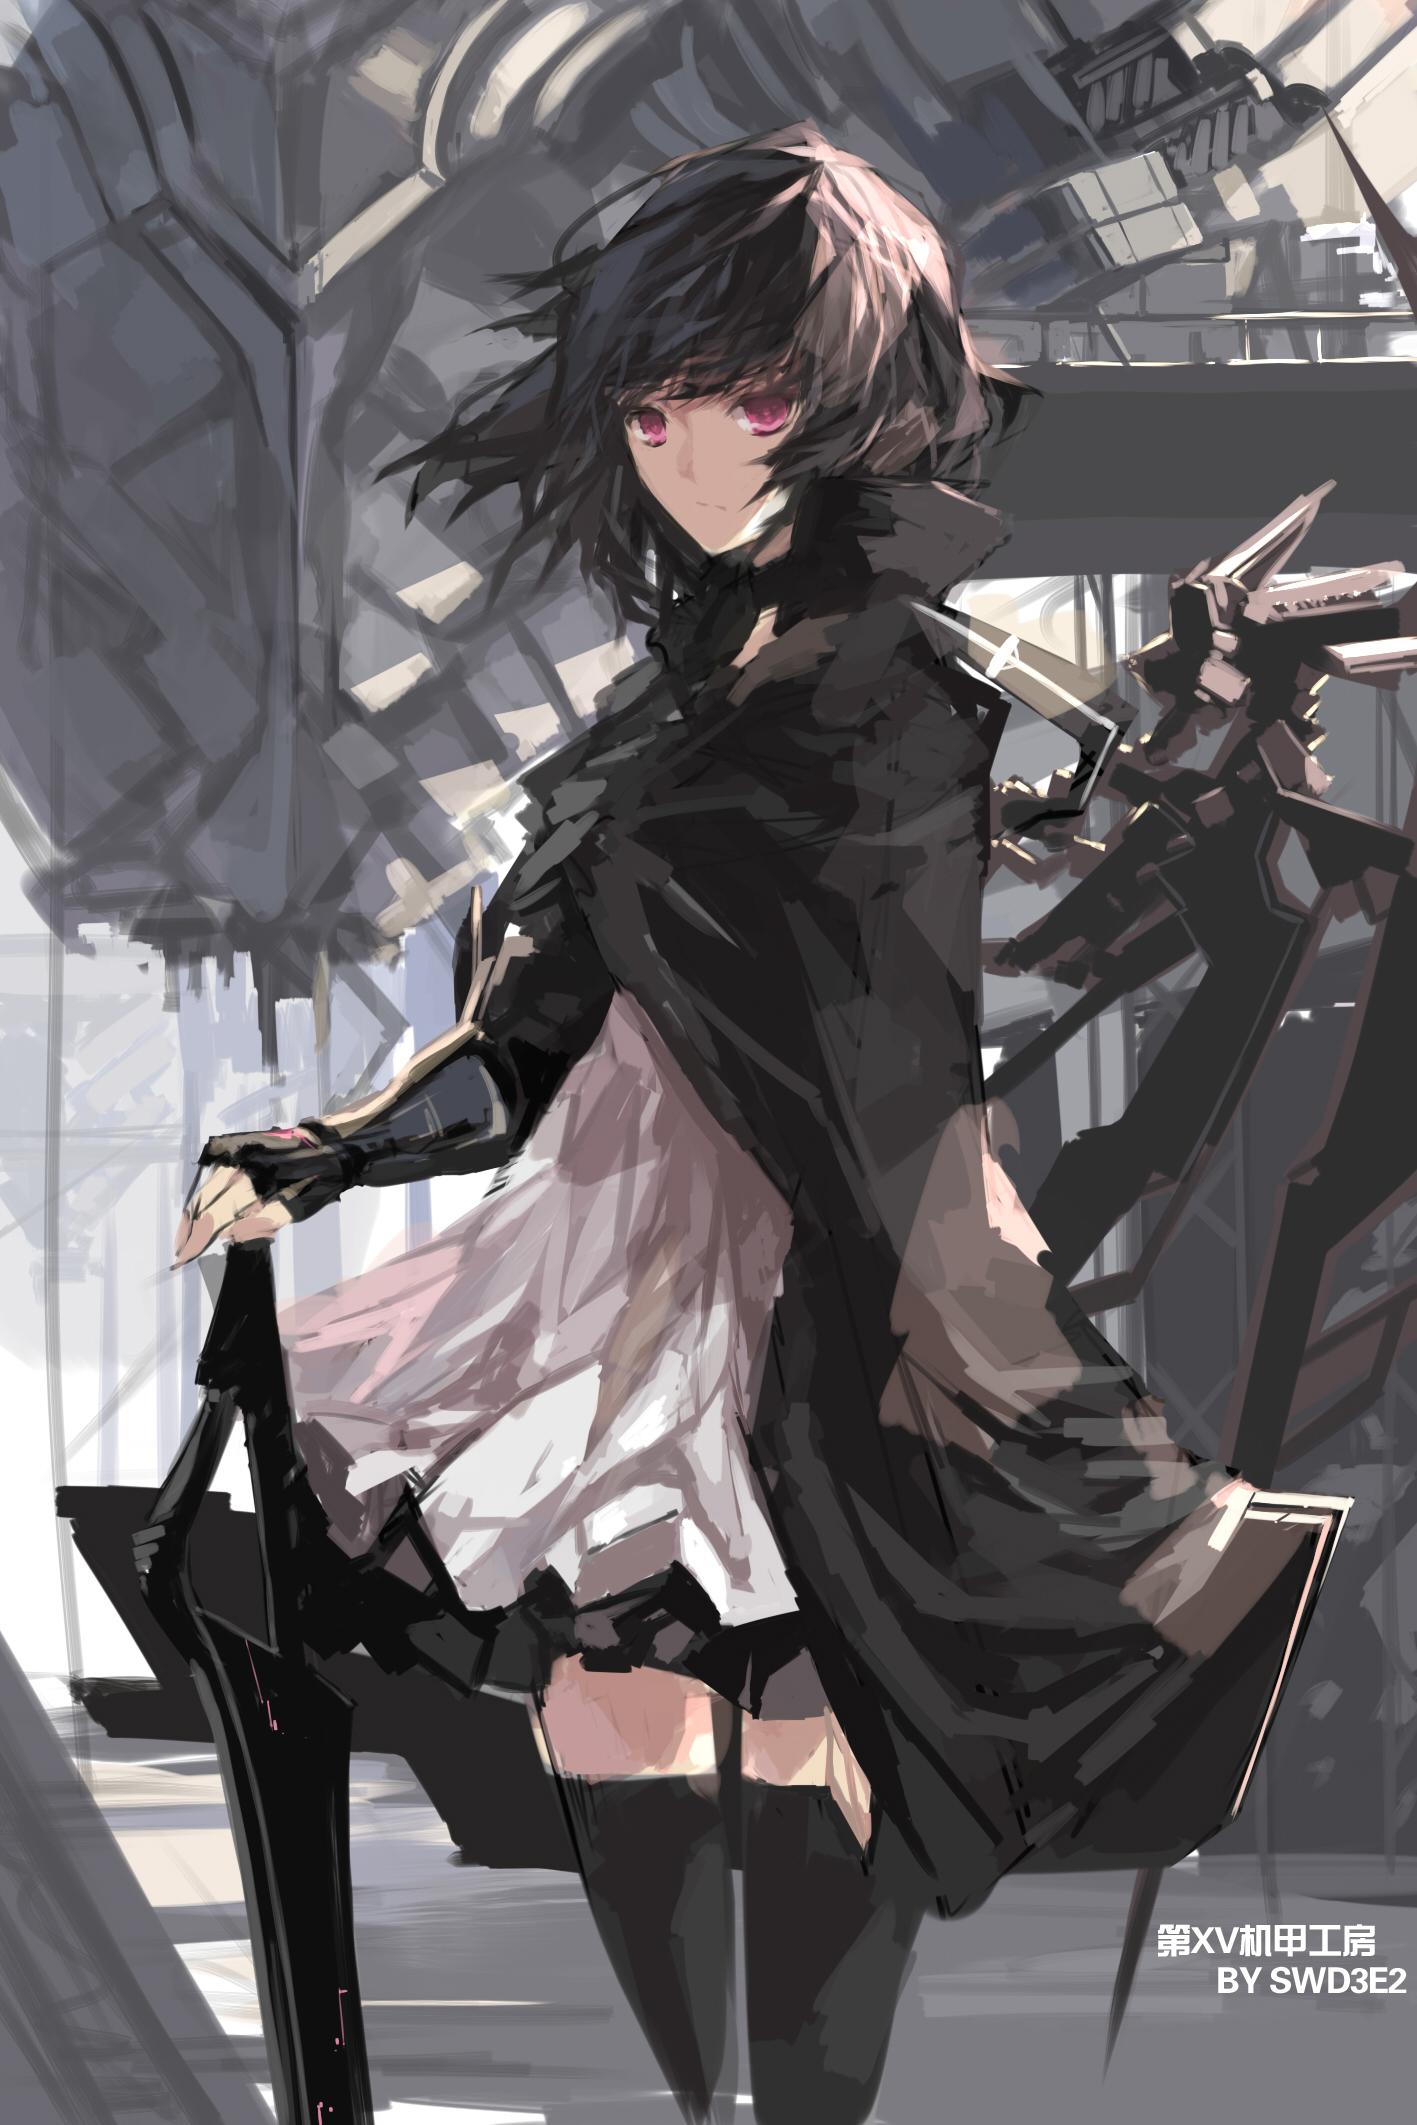 Anime Wallpaper Girls Hair Short Black Eyes Brown Swd3e2 Zerochan Anime Image Board